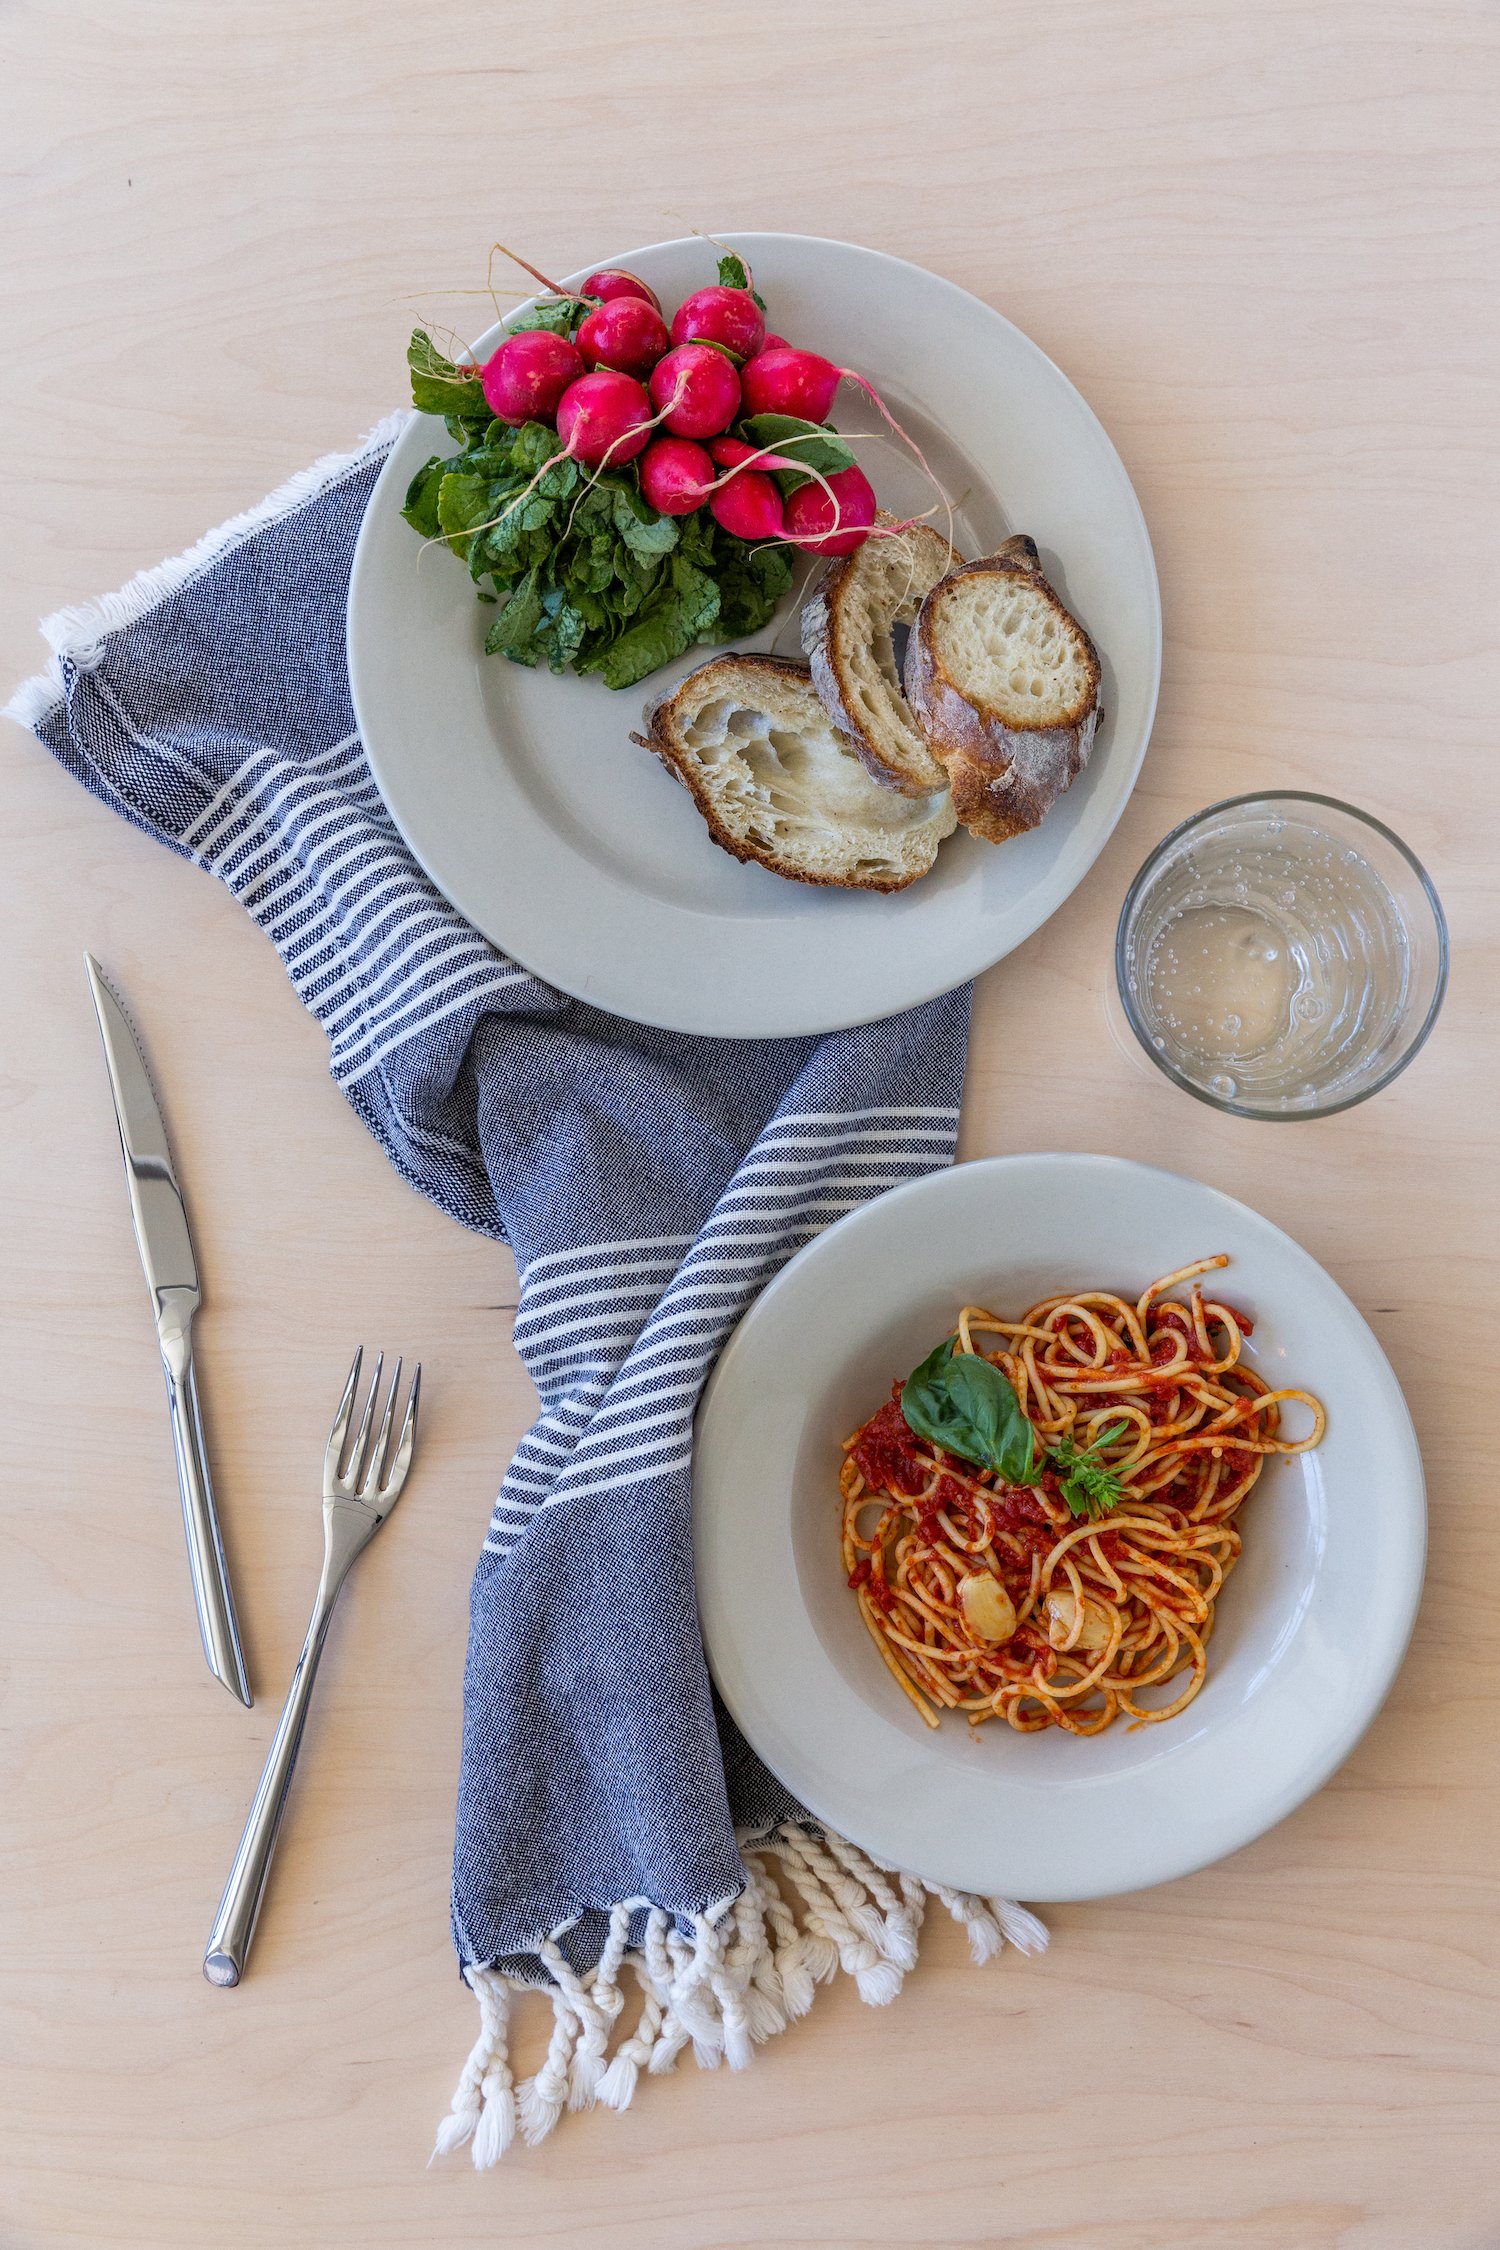 Plates, bowls, glasses, forks, table knives